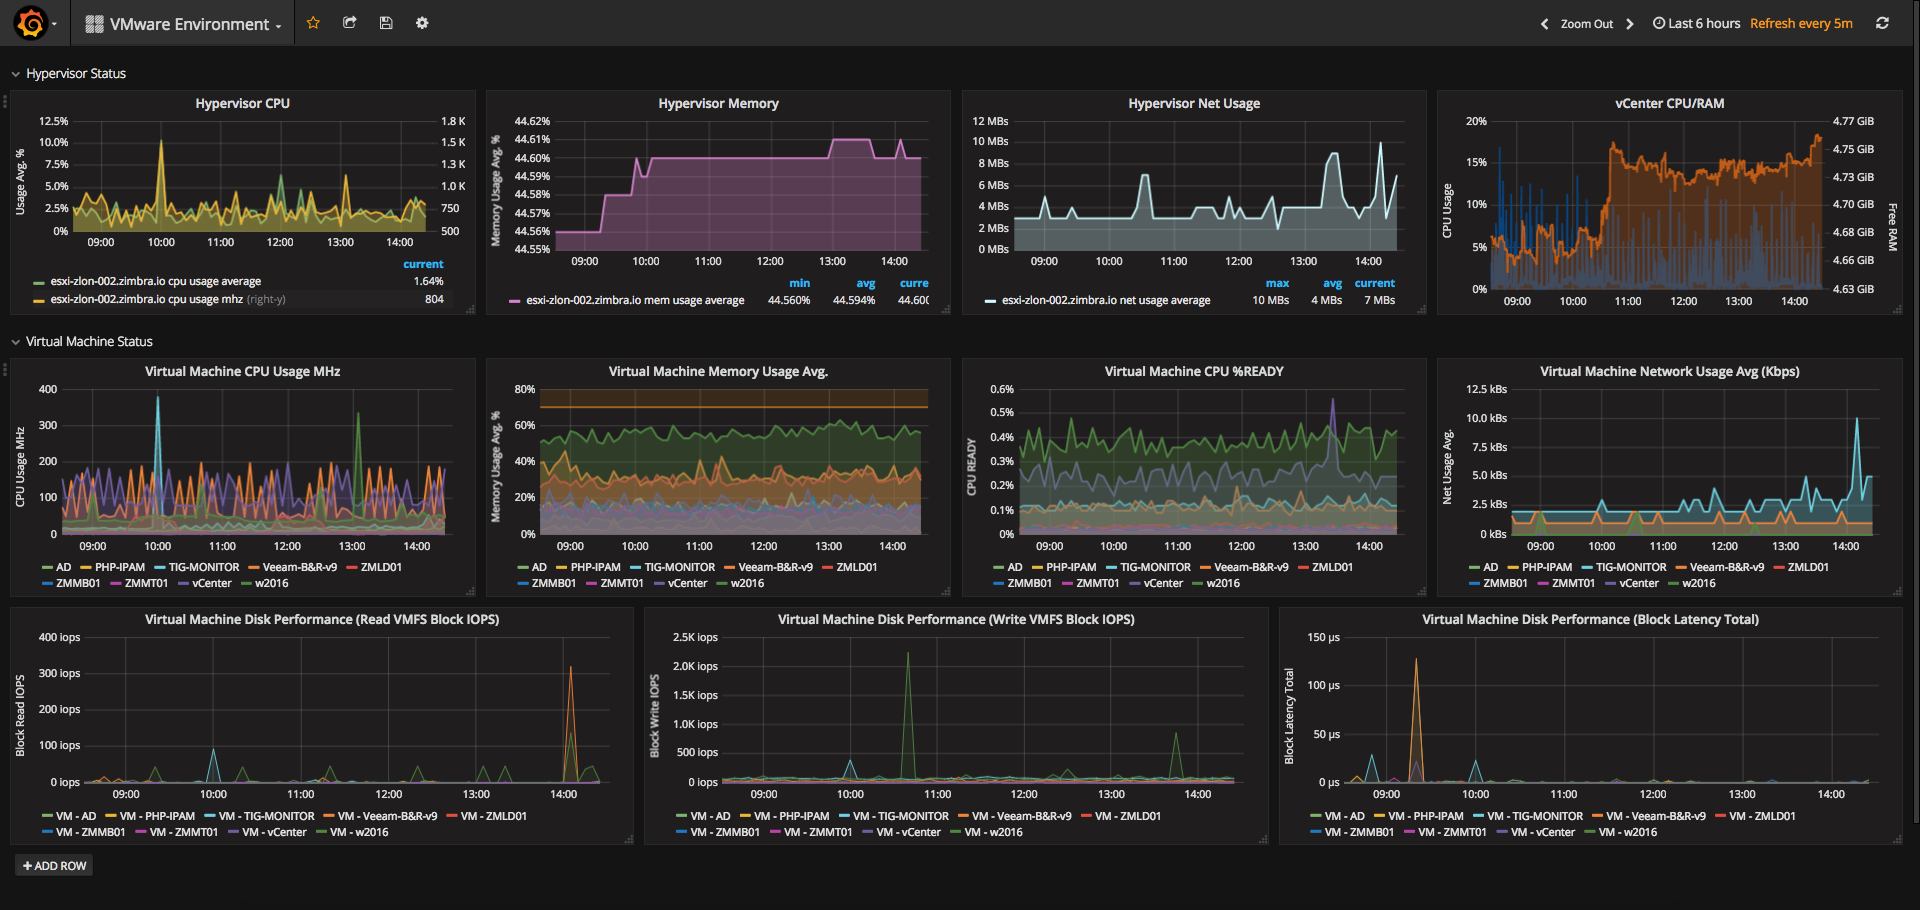 VMware Environment Performance dashboardData for Grafana